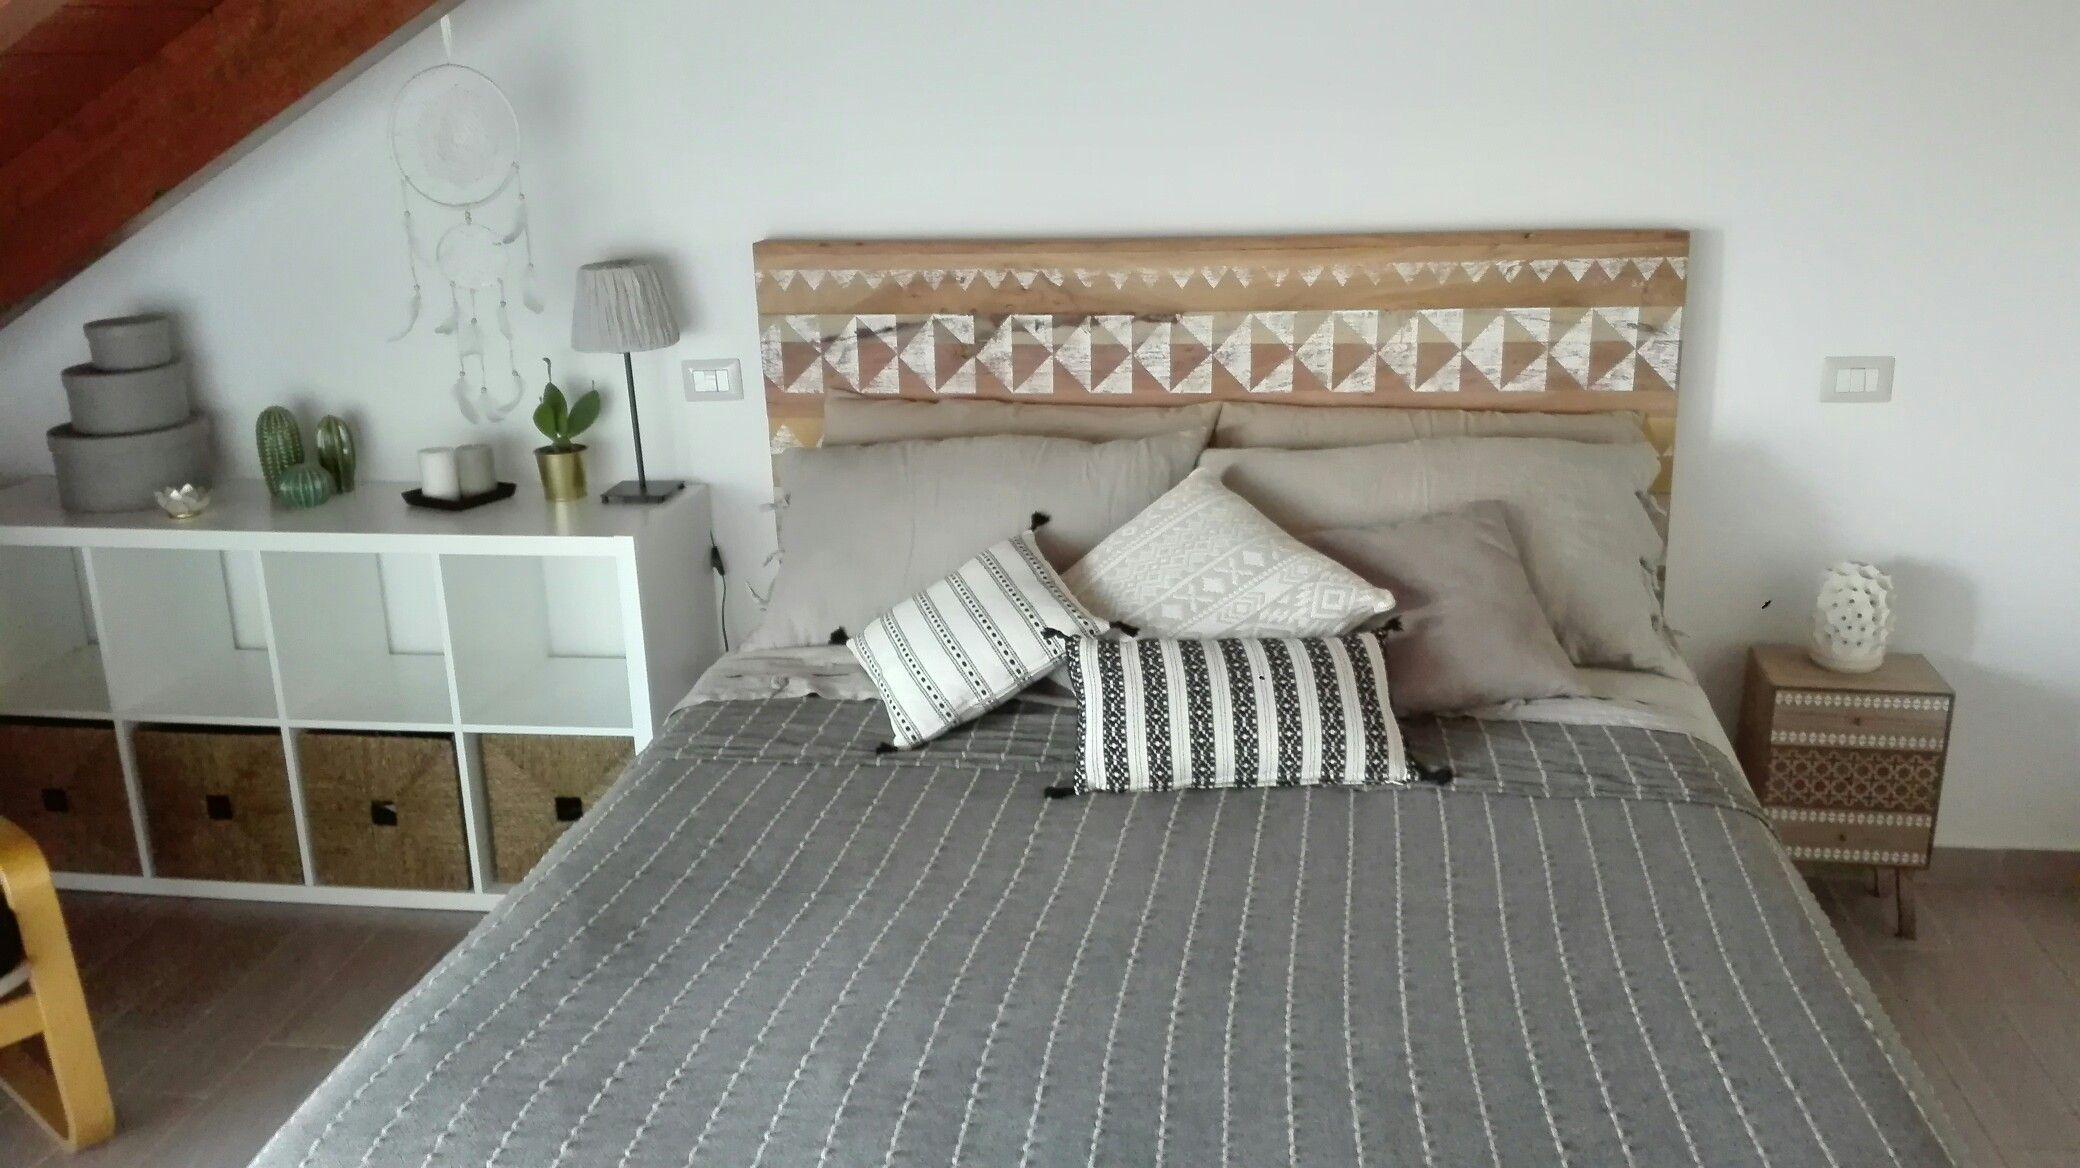 Camera da letto etnica - maison du monde   Sweet Home   Pinterest